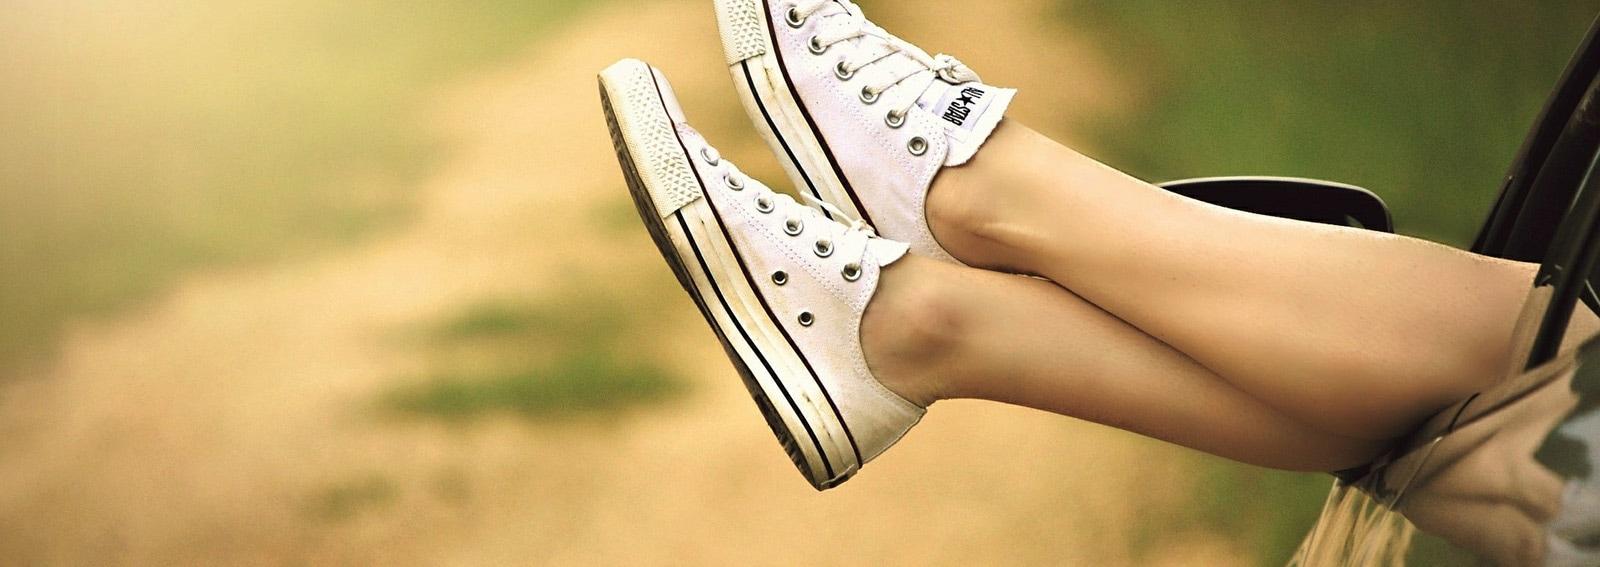 gambe zanzare desktop